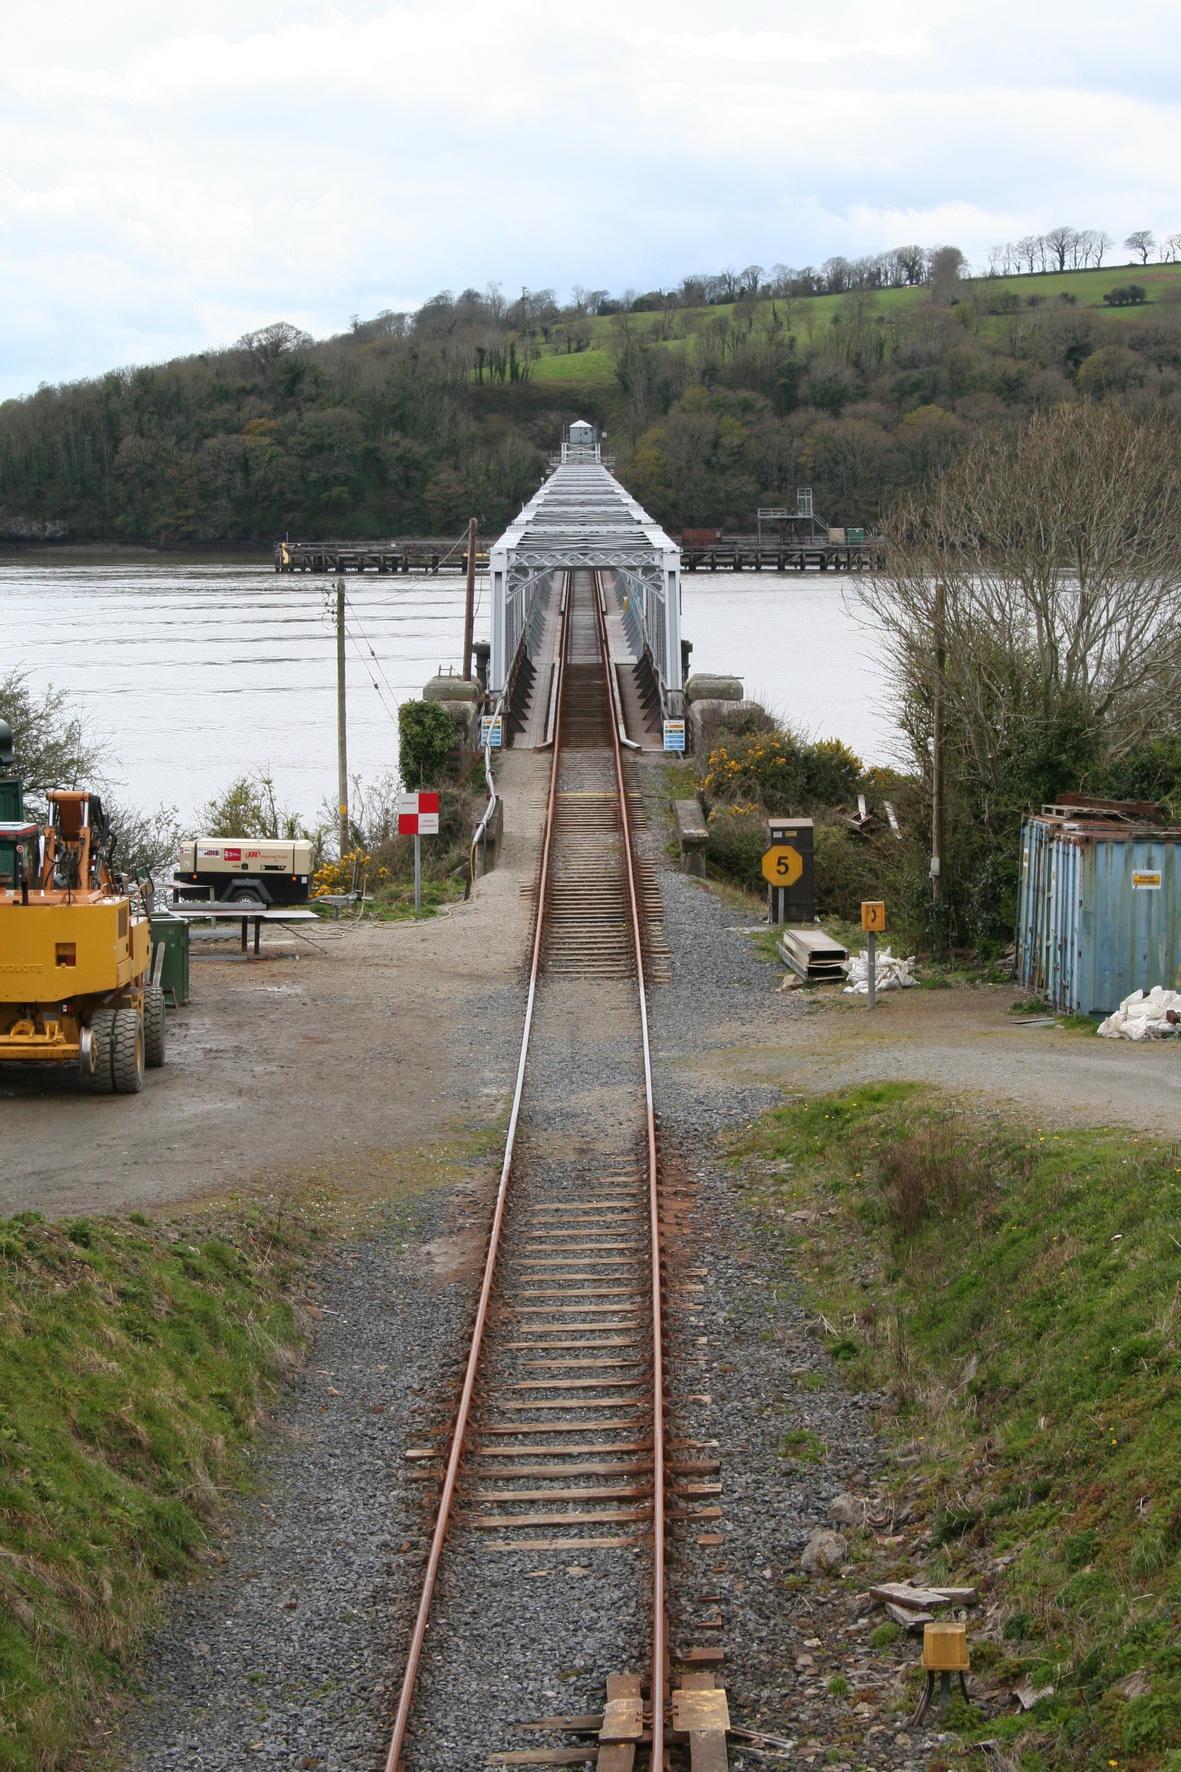 Looking across Barrow Bridge